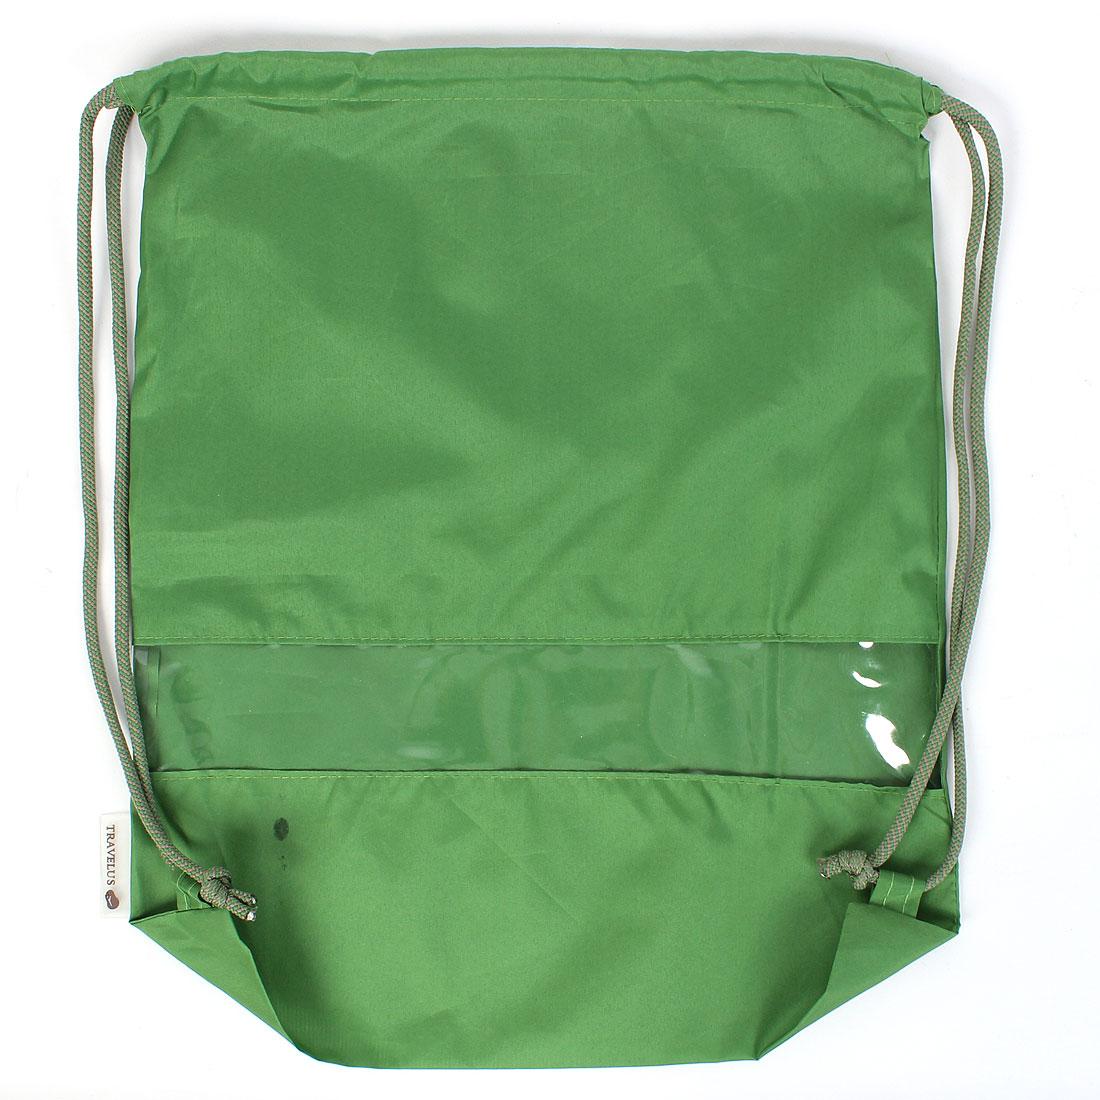 Green Nylon Drawstring Beach Gym Storage Shoulder Bag Back Pack